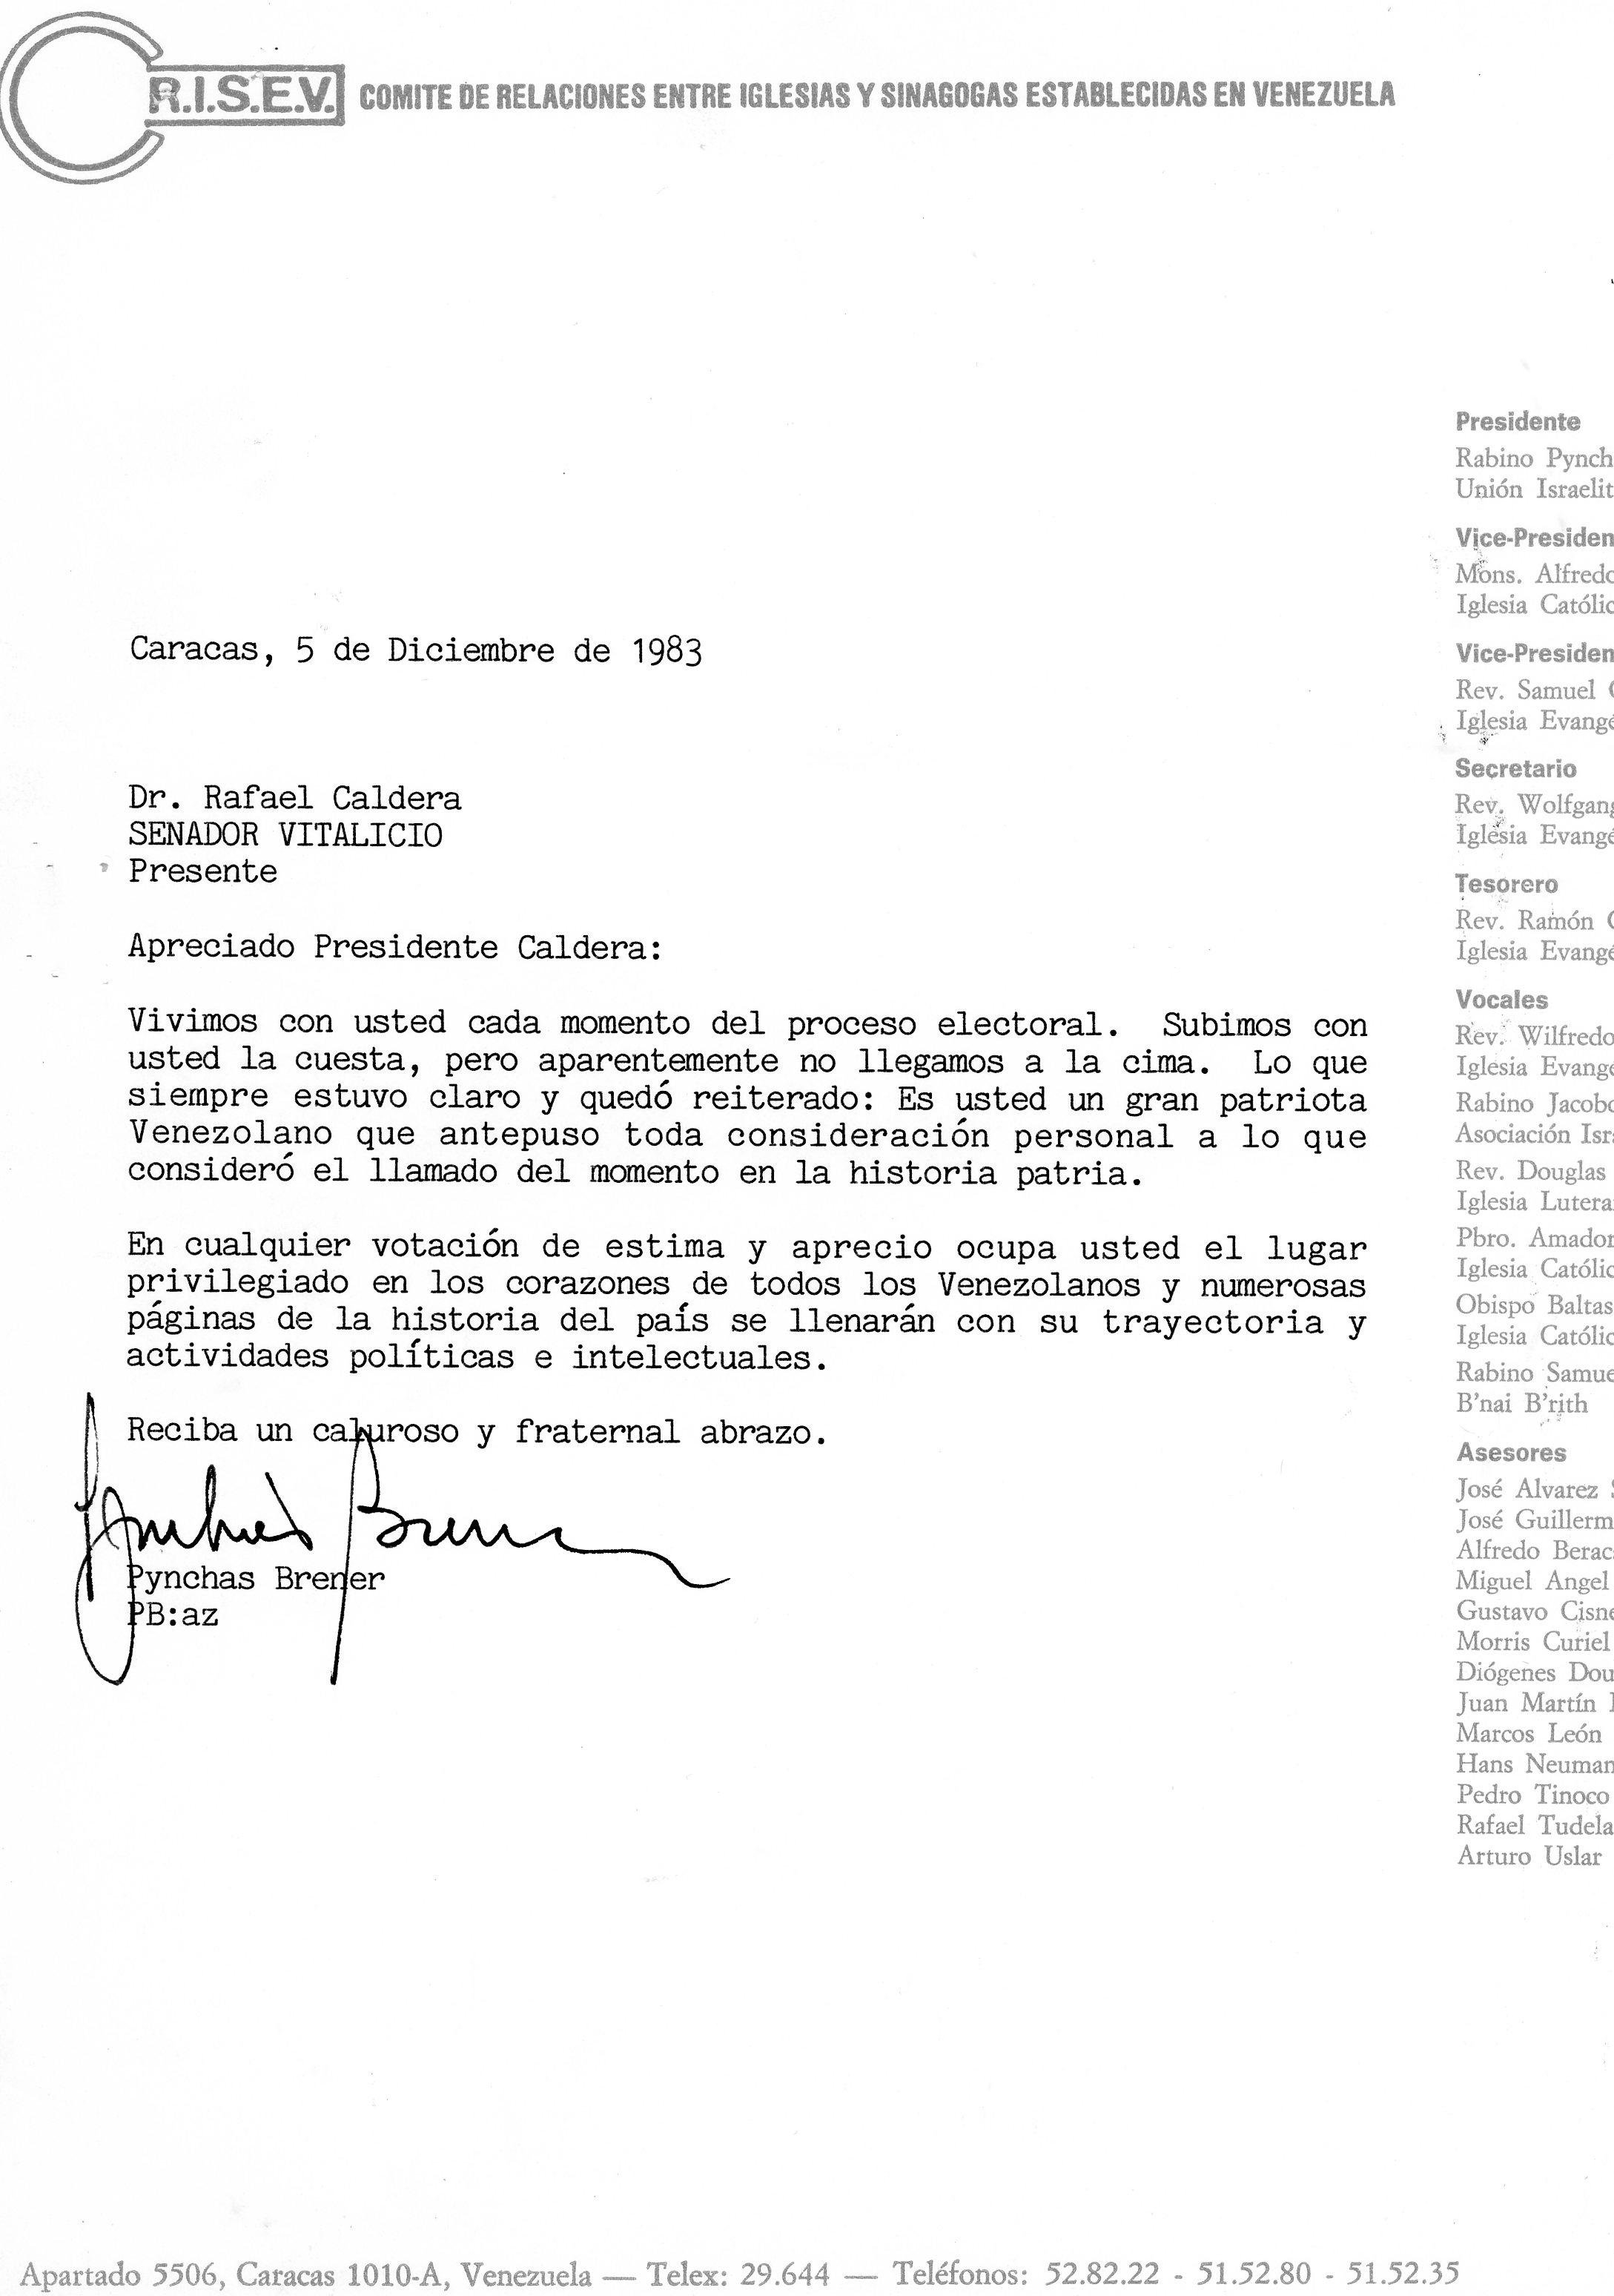 1983. Diciembre, 5. Carta del rabino Pynchas Brener a Rafael Caldera